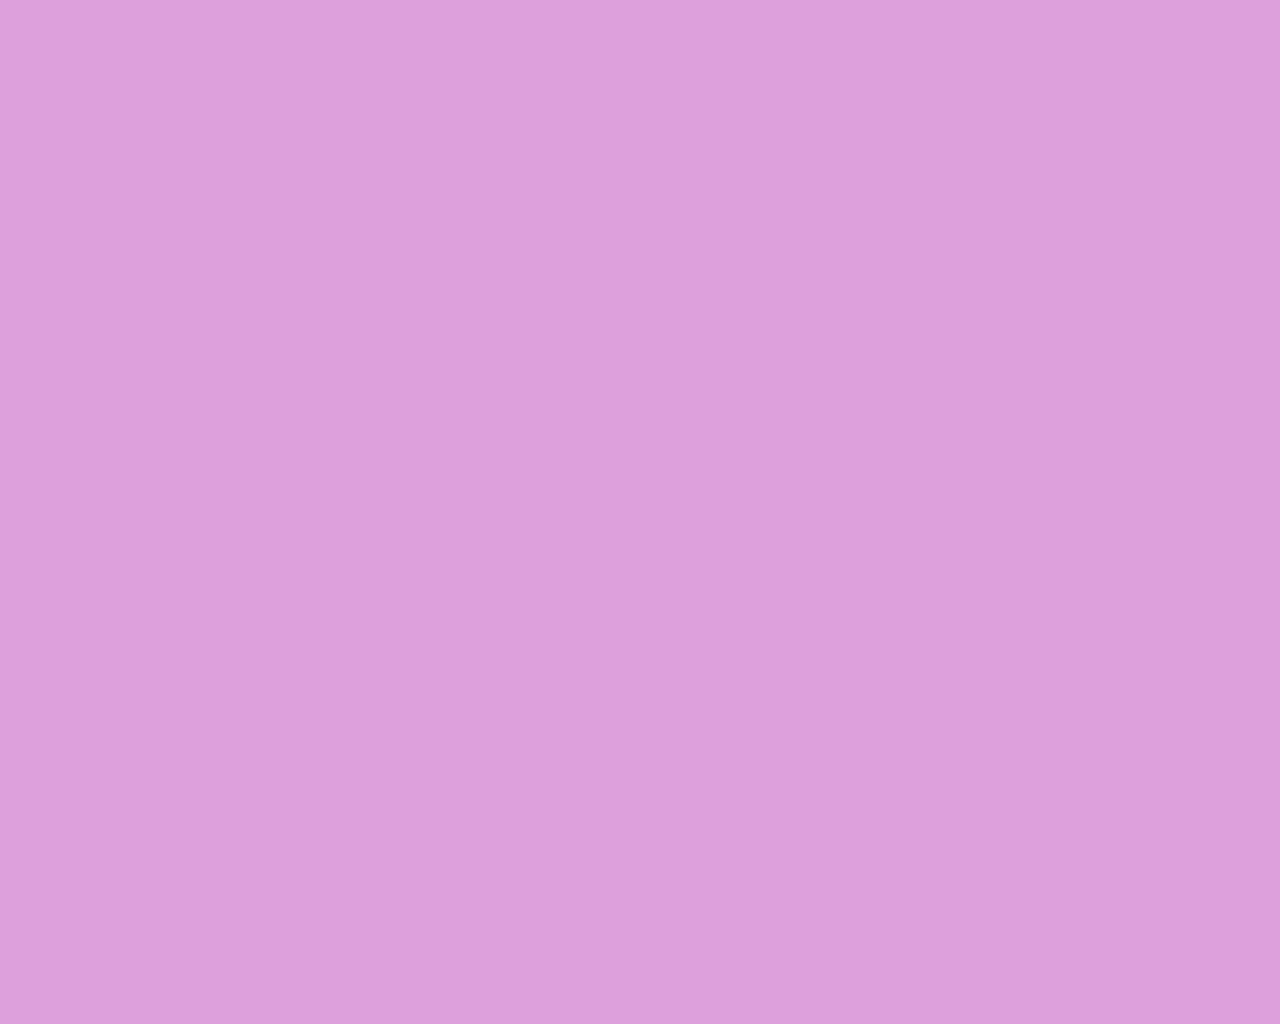 1280x1024 Plum Web Solid Color Background